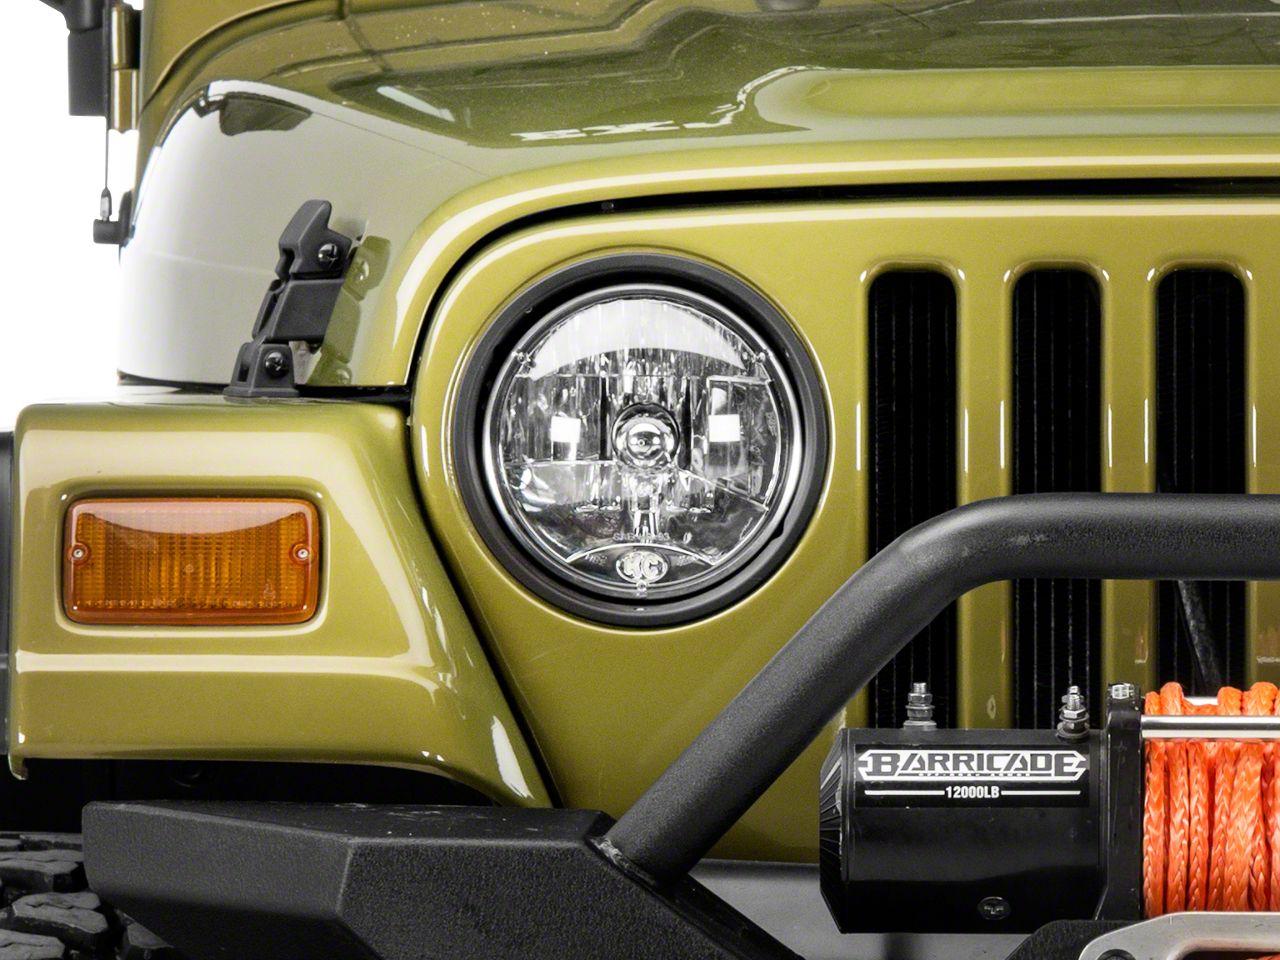 Kc Hilites Jeep Wrangler 7 In Headlight H4 Single 4230 97 06 Jeep Wrangler Tj